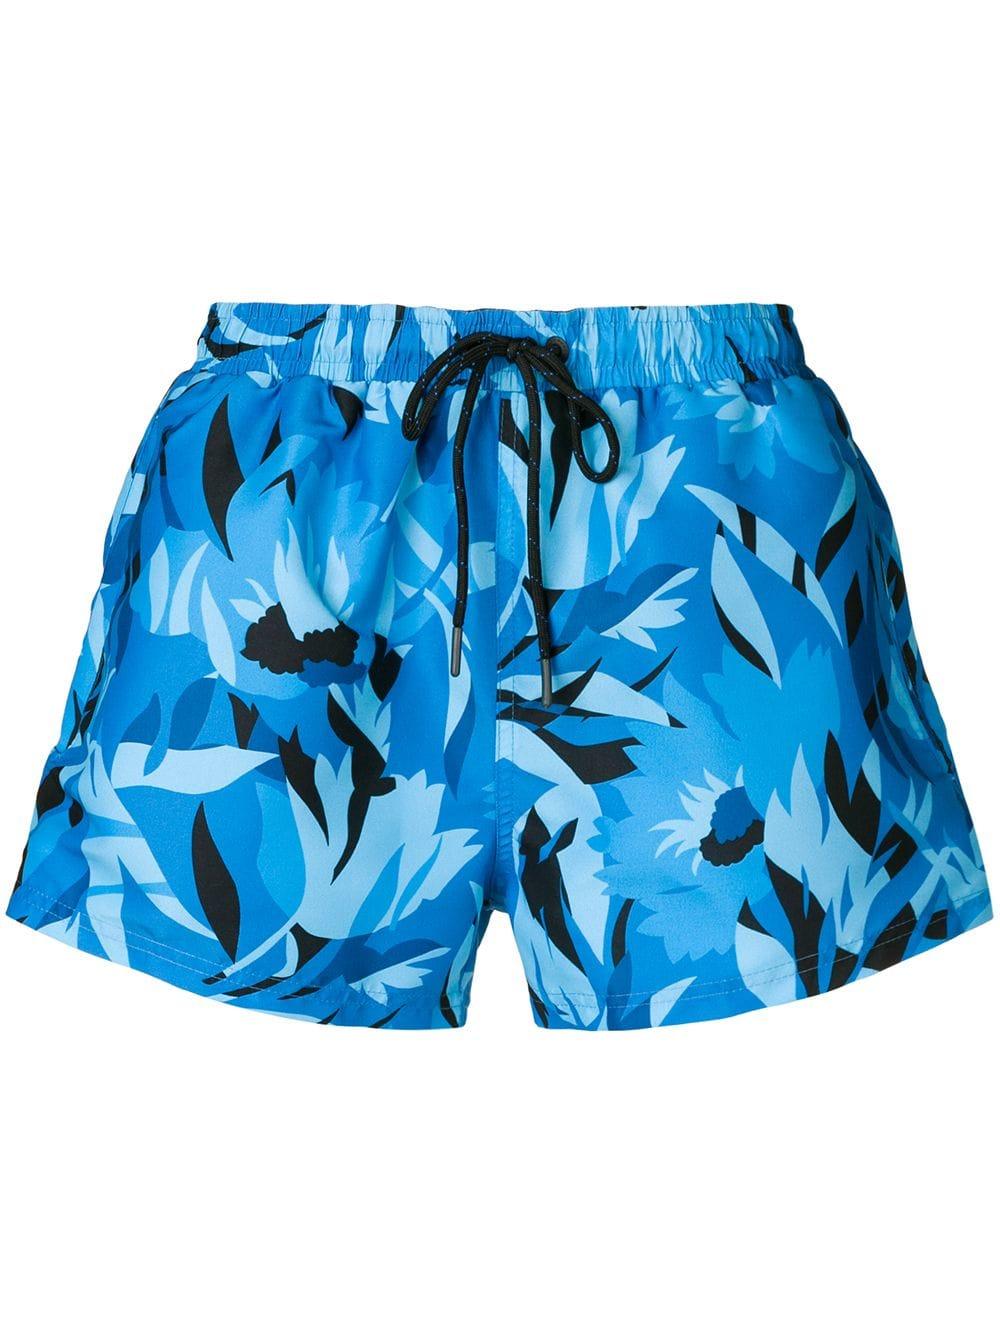 83f14ce96 BOSS HUGO BOSS BOSS HUGO BOSS BARRELEYE SWIM SHORTS - BLUE. #bosshugoboss  #cloth